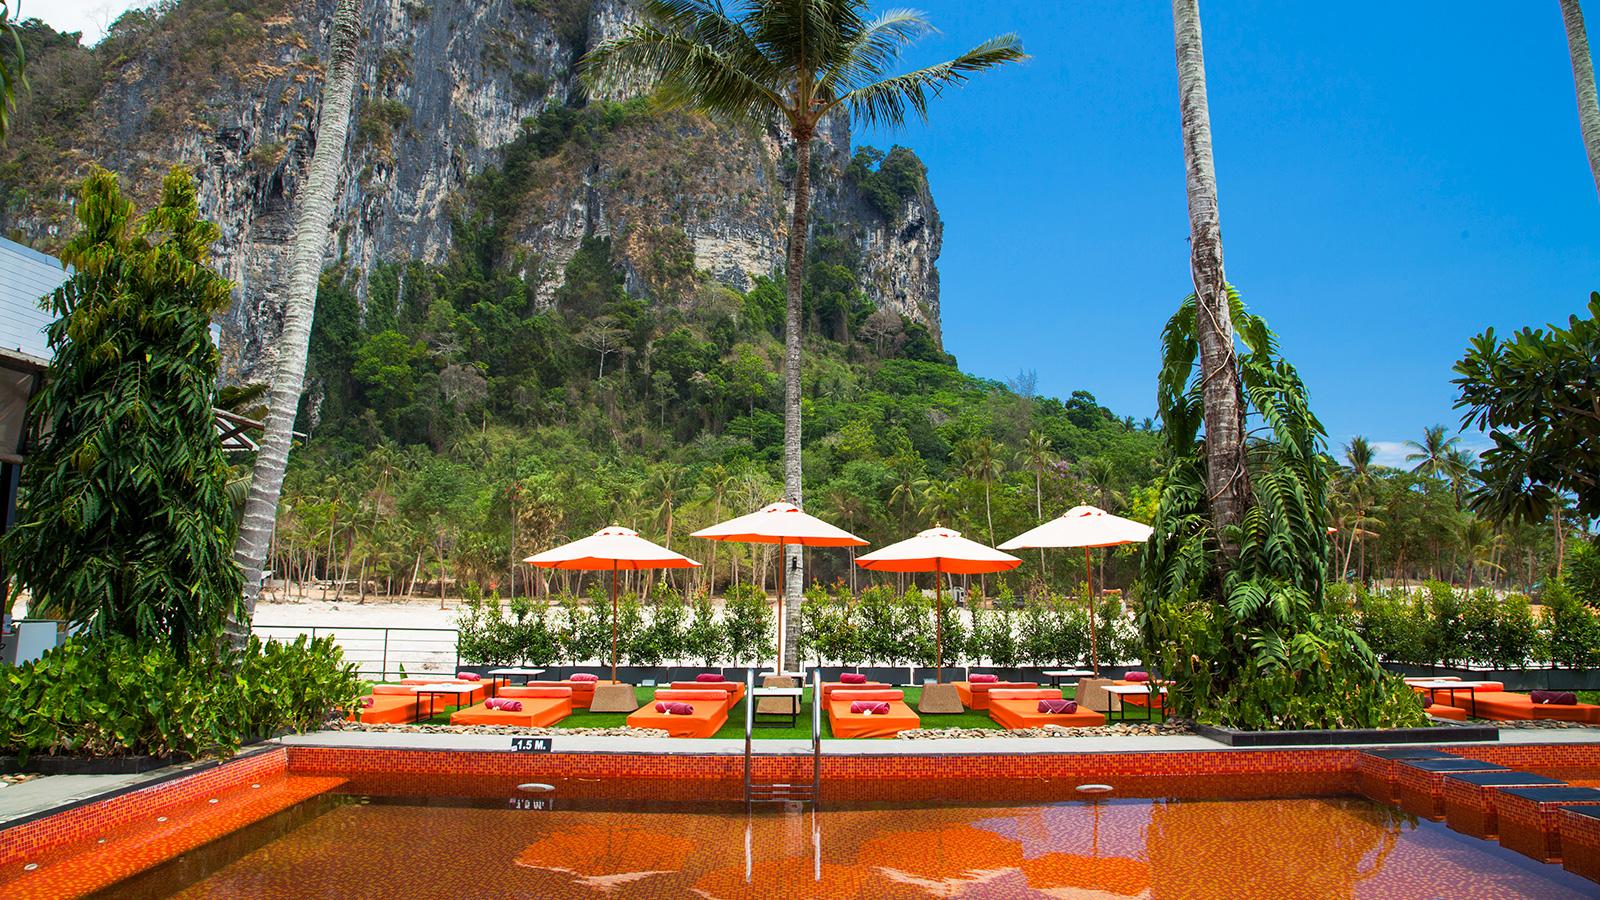 هتل اونانگ پارادایس ریزورت کرابی (Aonang Paradise Resort Krabi)